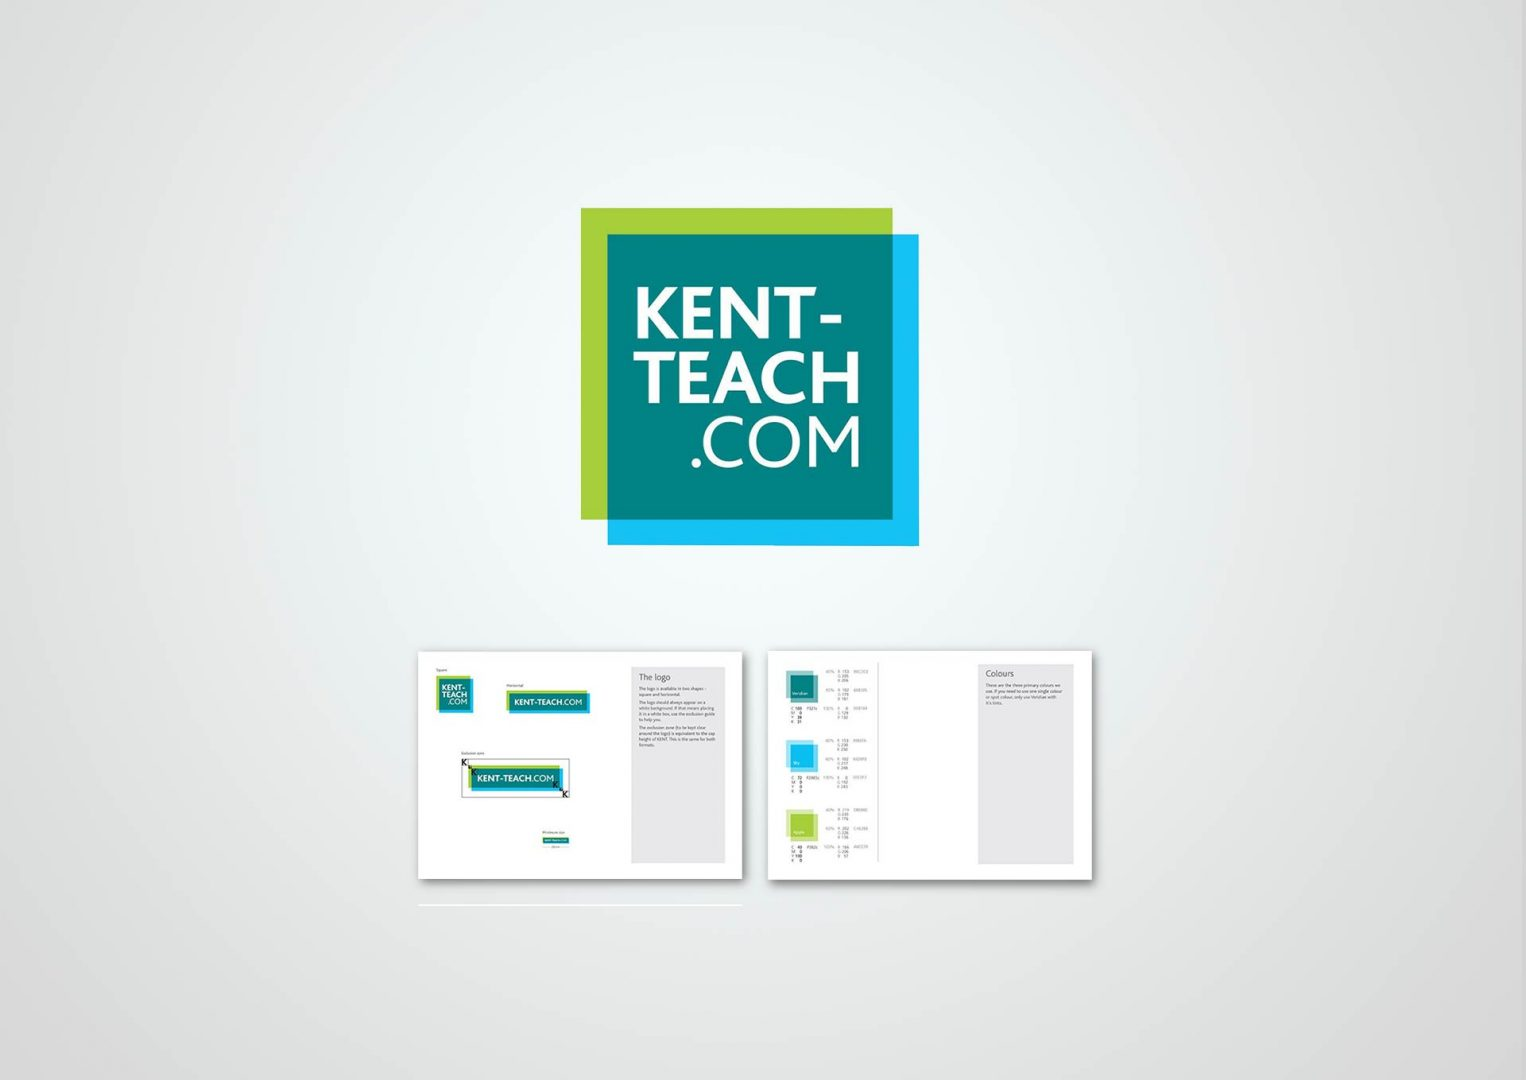 Kent Teach, Logo design, Graphic Designer, Photoshop, Branding, Romford, Essex, Jan Lewis Creative